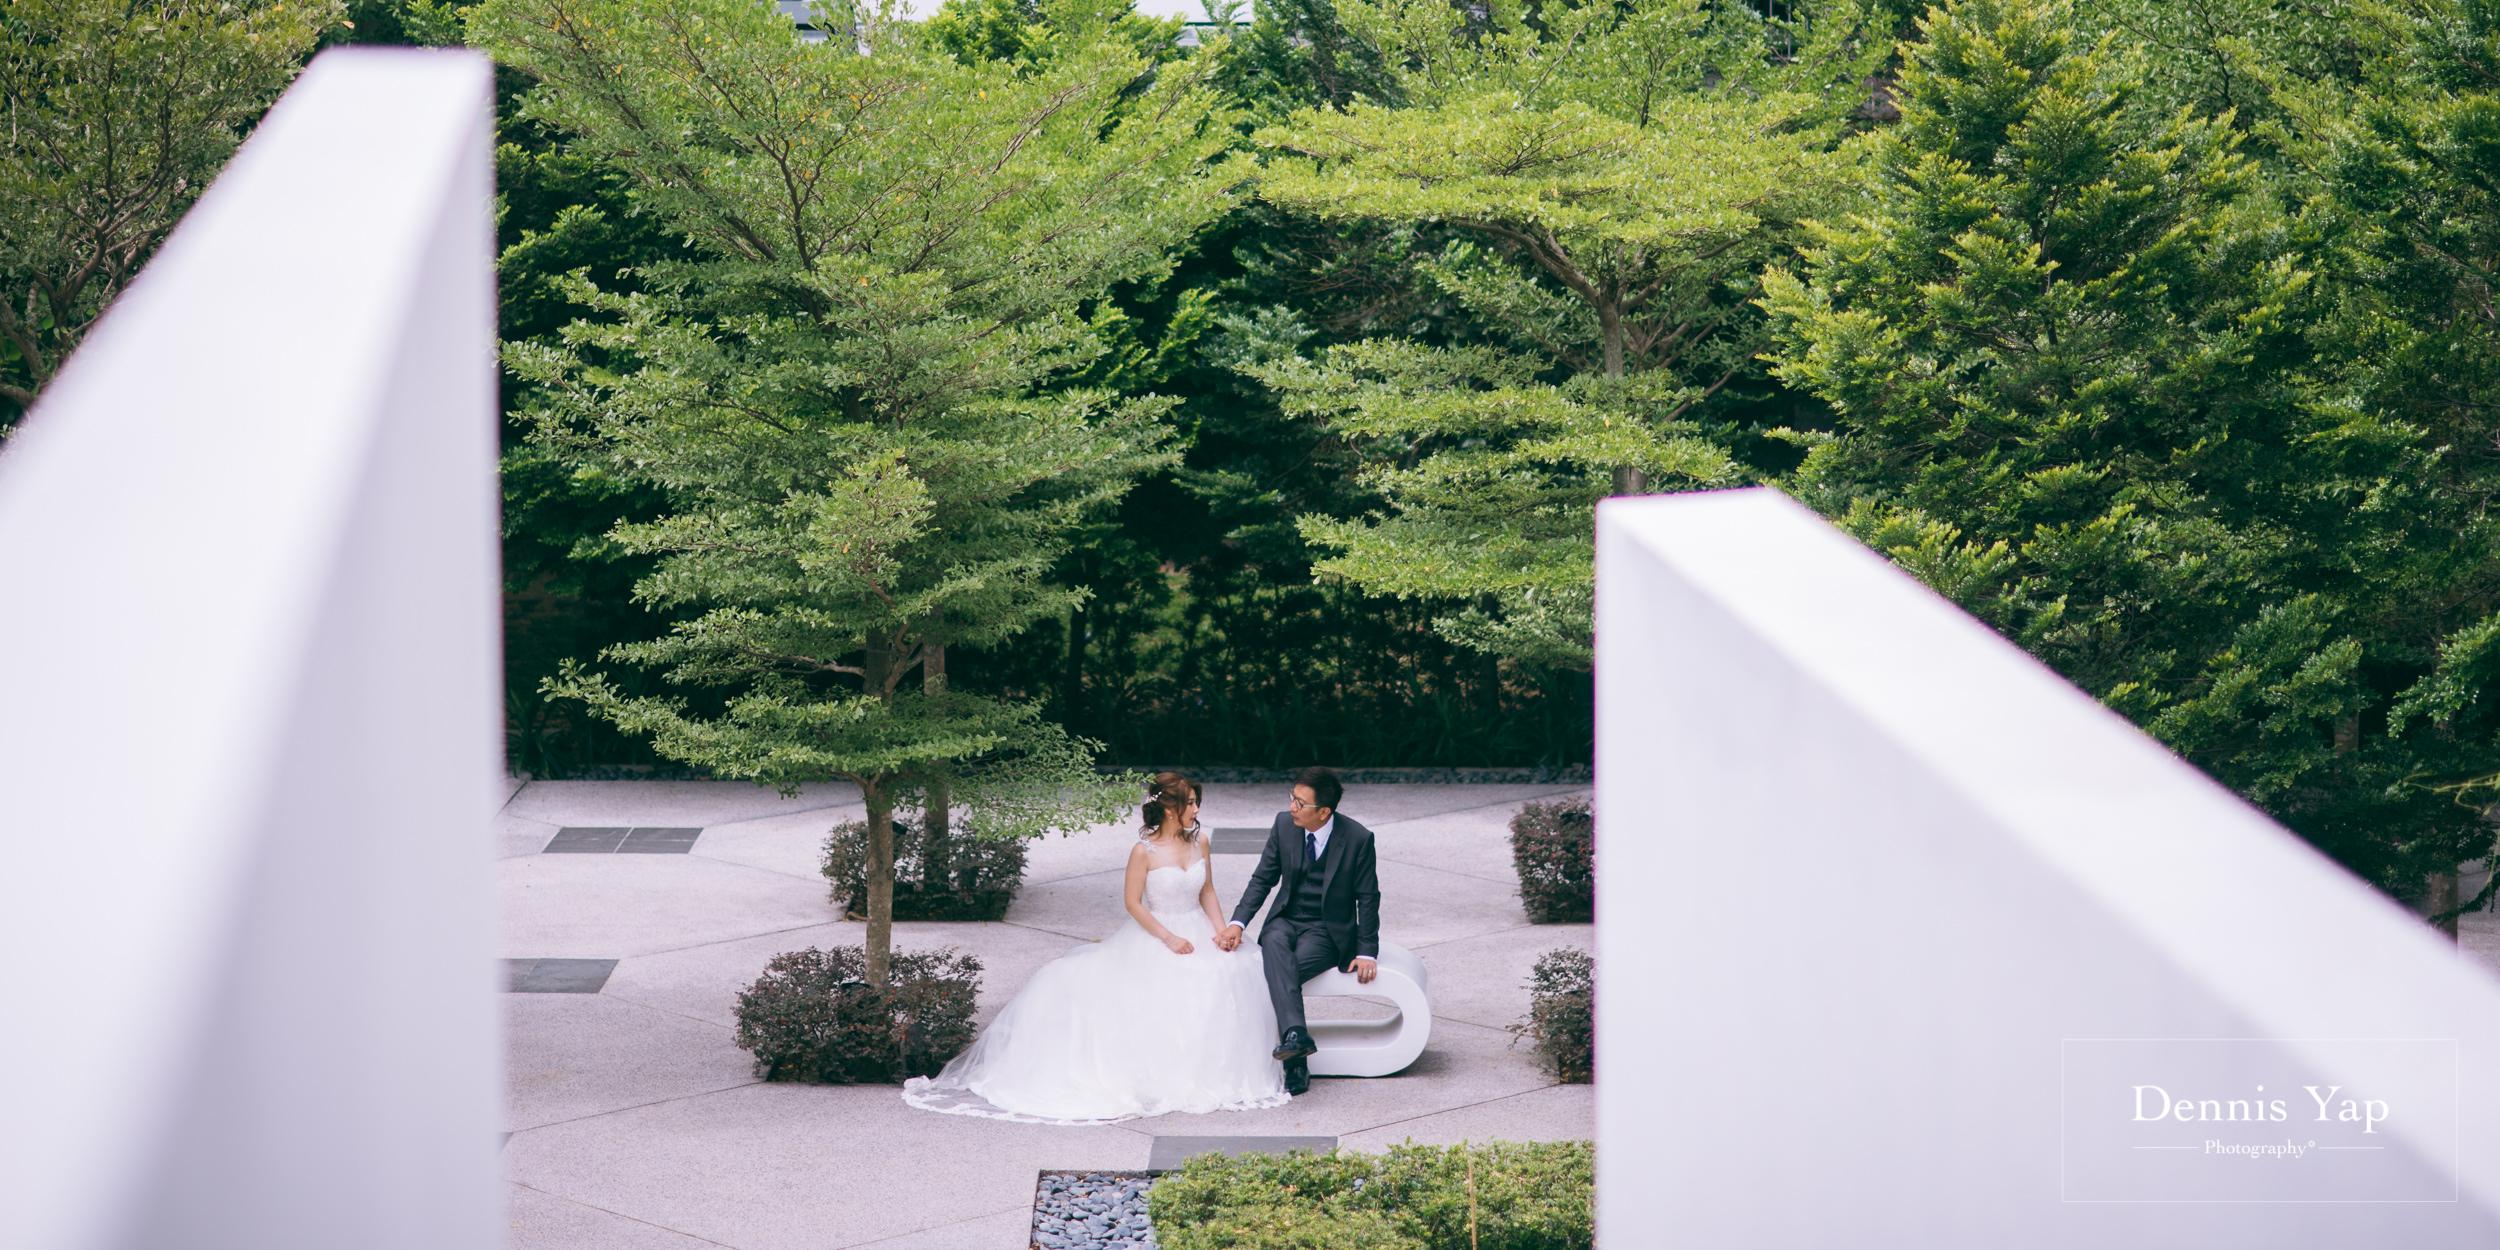 pung doris pre wedding desa park dennis yap photography-27.jpg